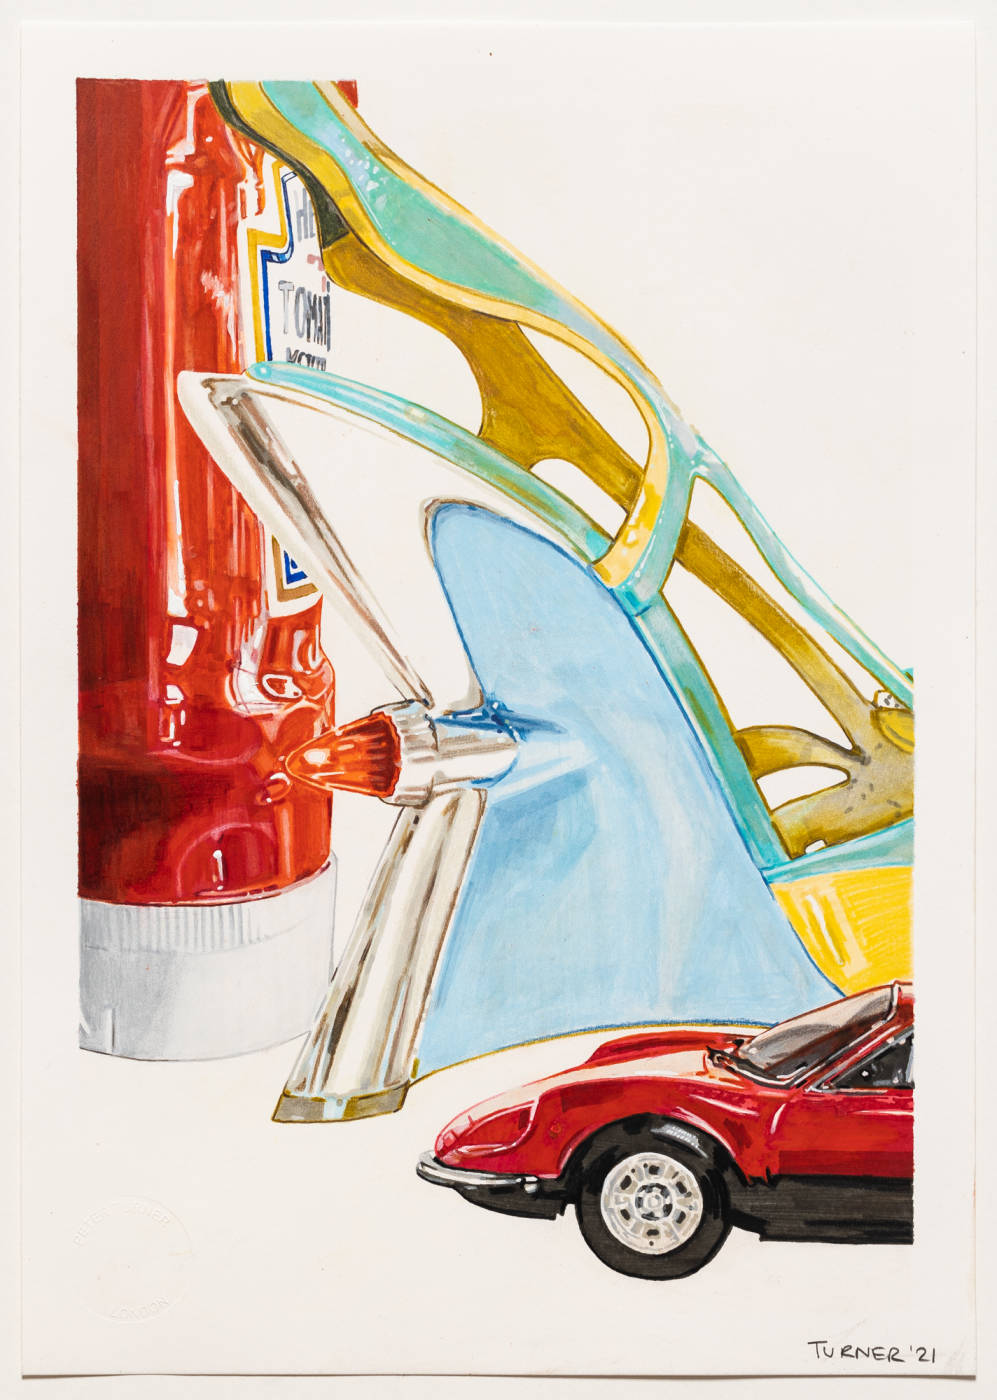 Prada 'Hot Rod' wedge, Heinz Tomato Ketchup bottle, Ferrari Dino 246 GT model car